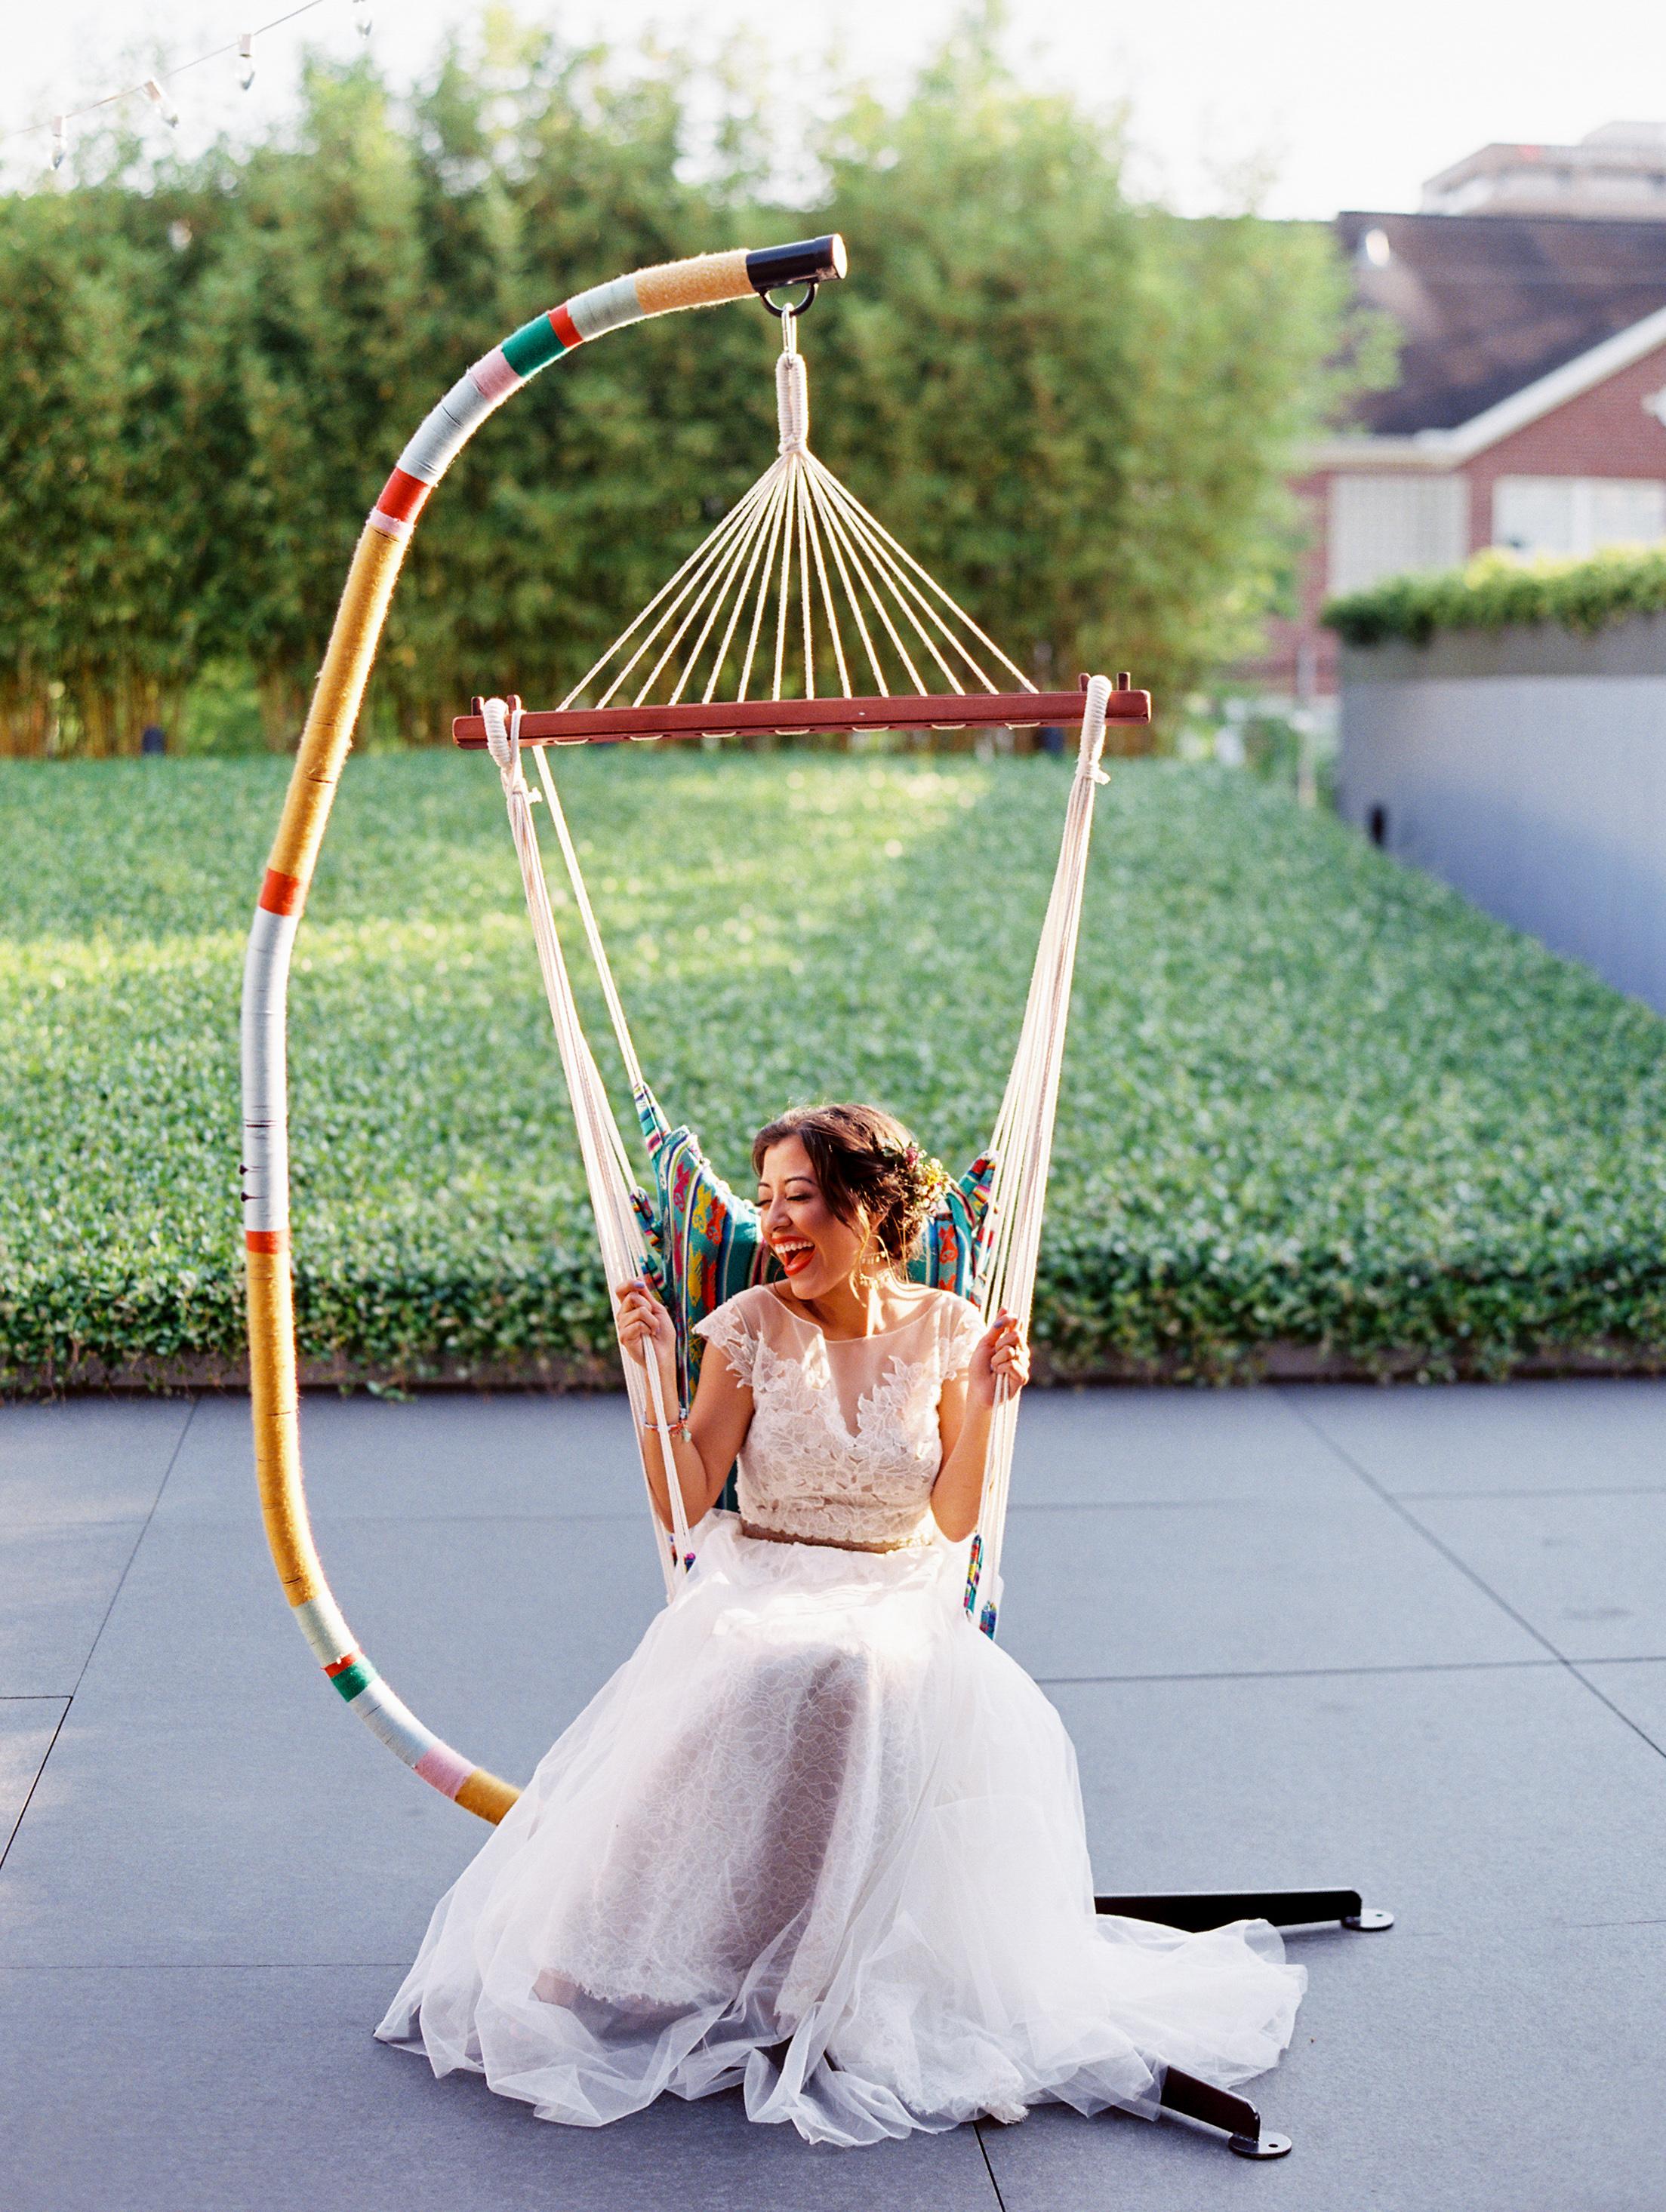 Dana-Fernandez-Photography-Martha-Stewart-Weddings-Houston-Texas-Wedding-Photographer-Film-42.jpg